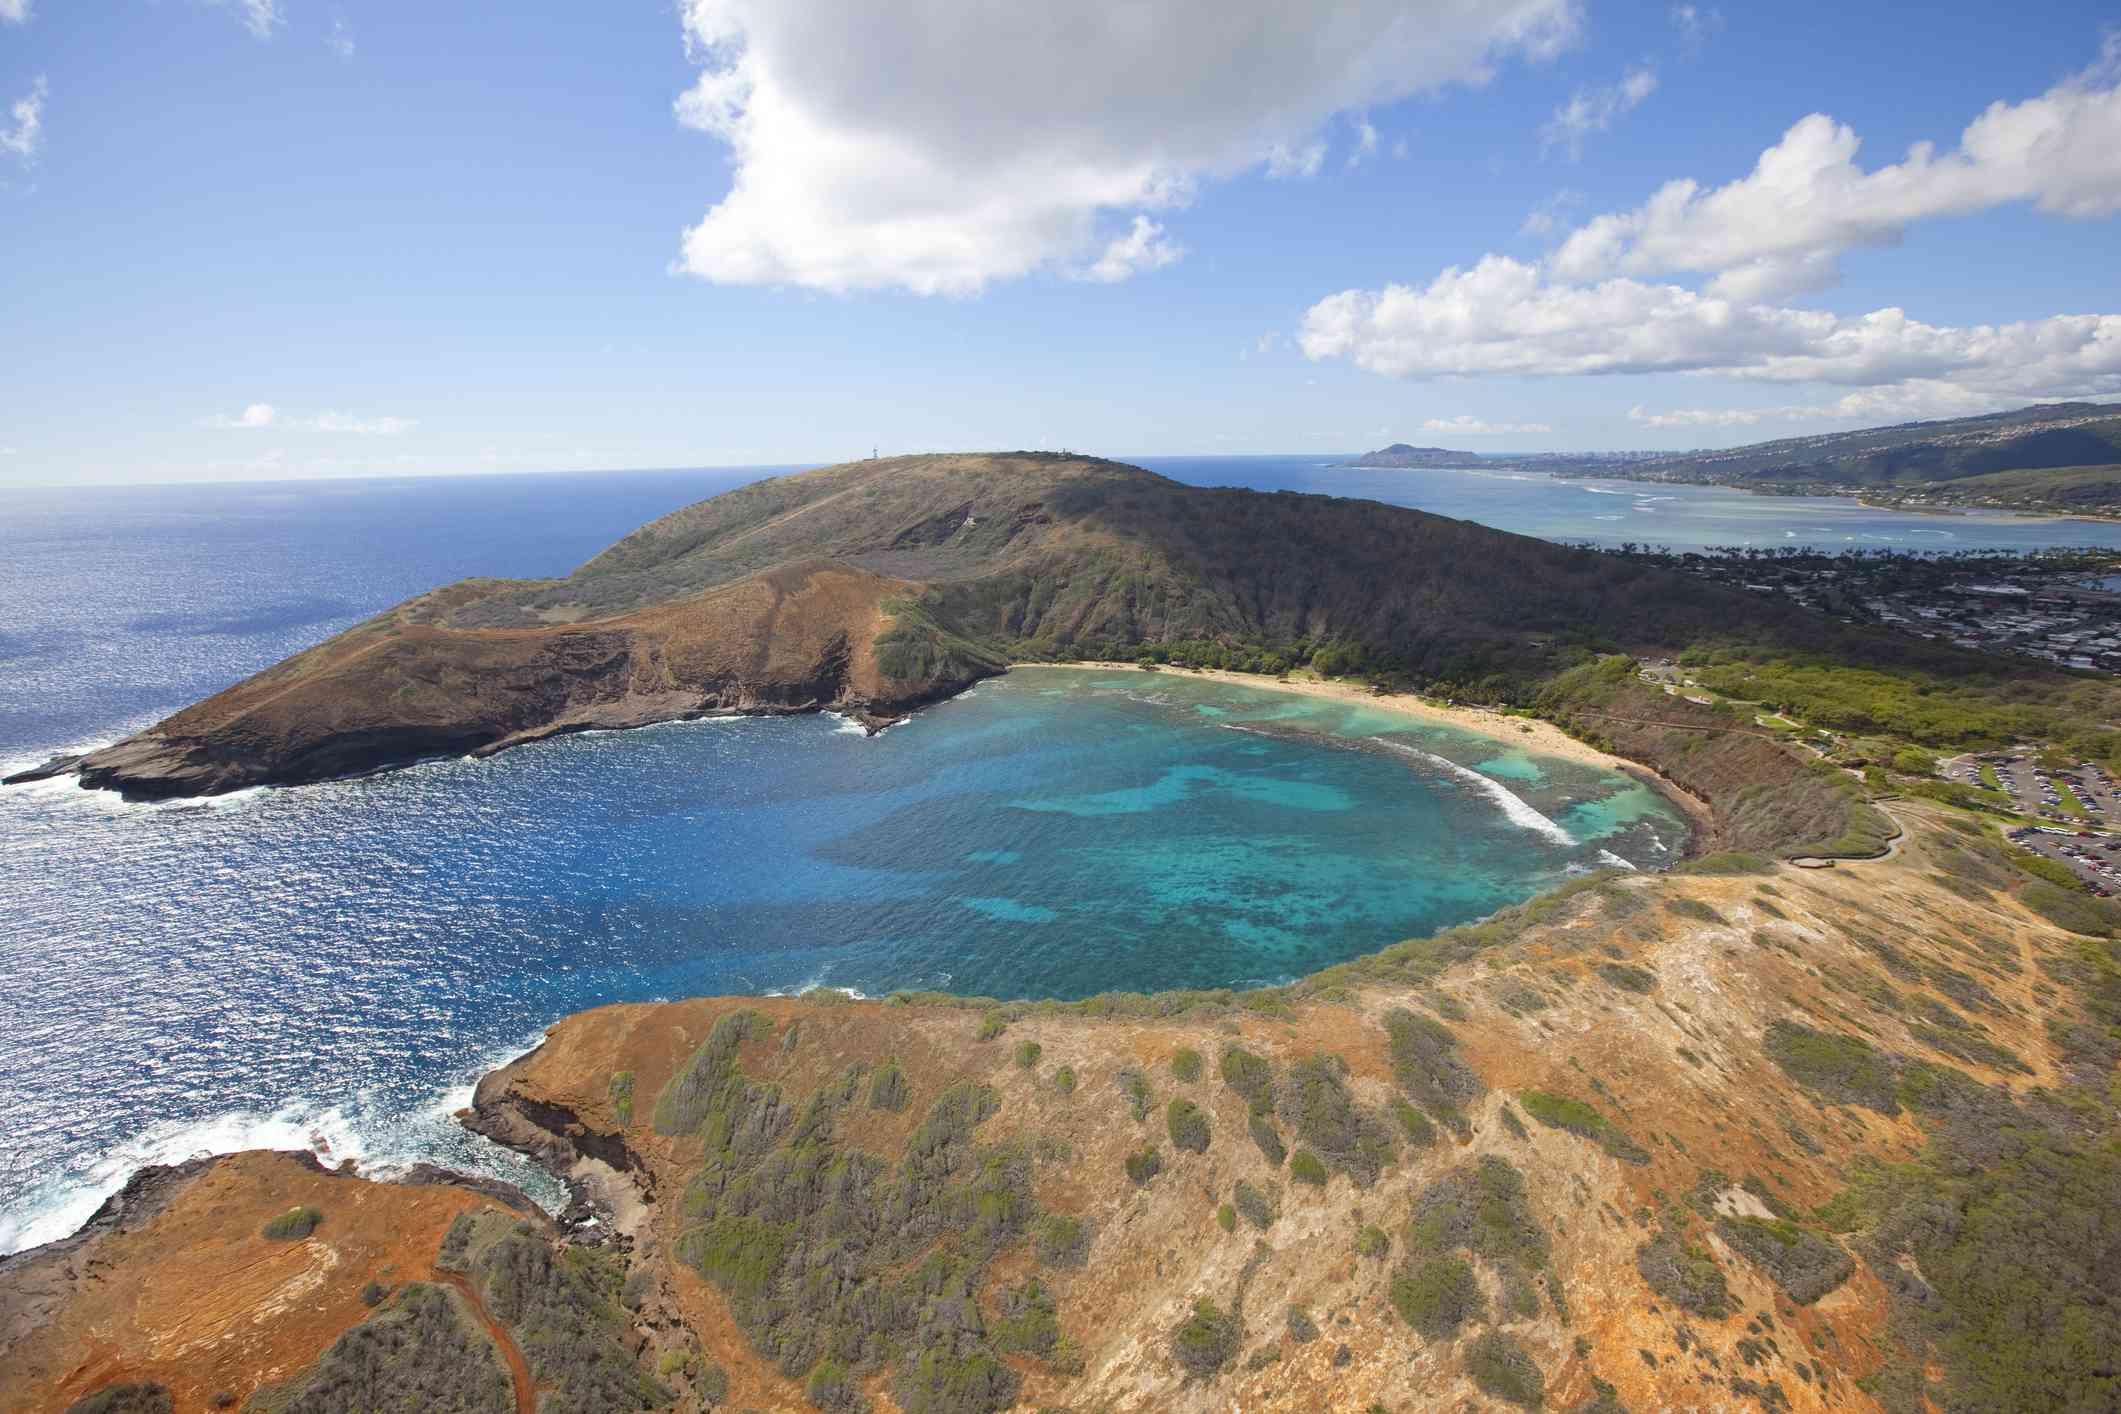 Arial view of Hanauma Bay on Oahu